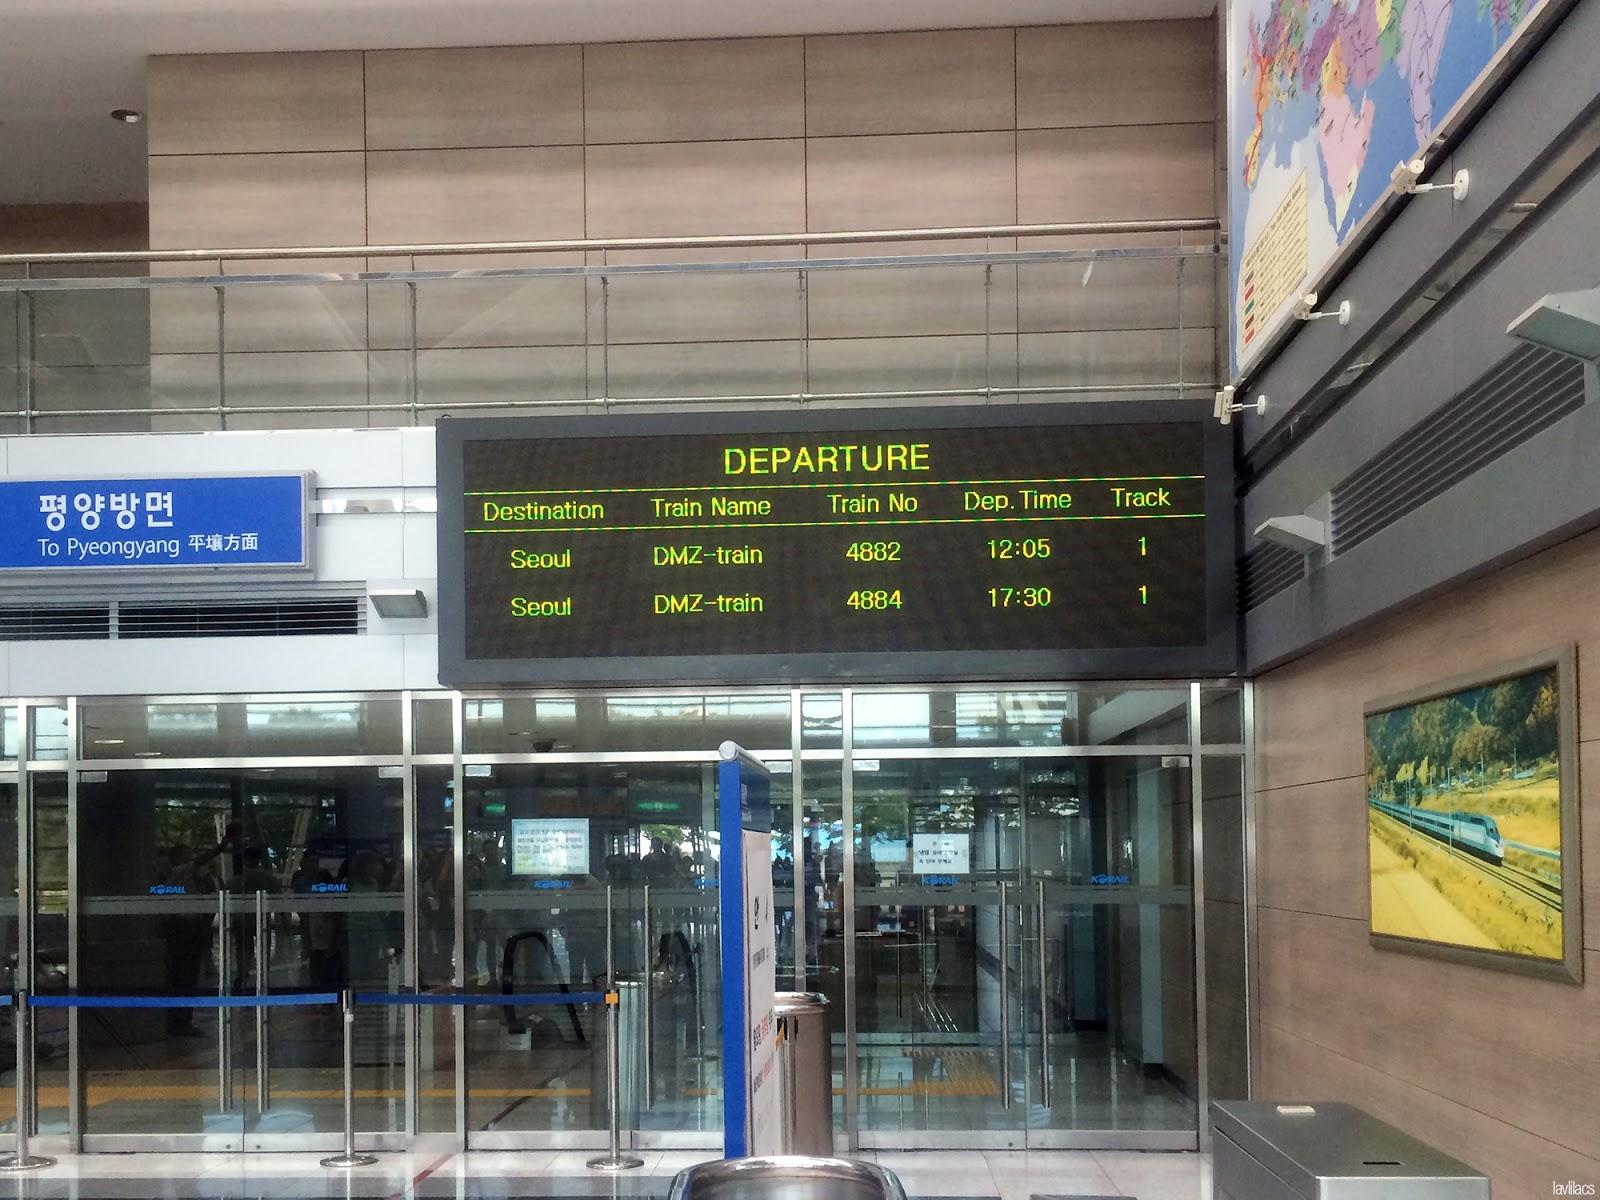 Seoul, Korea - Summer Study Abroad 2014 - Korail Interconnected Gyeongui Railroad Line station